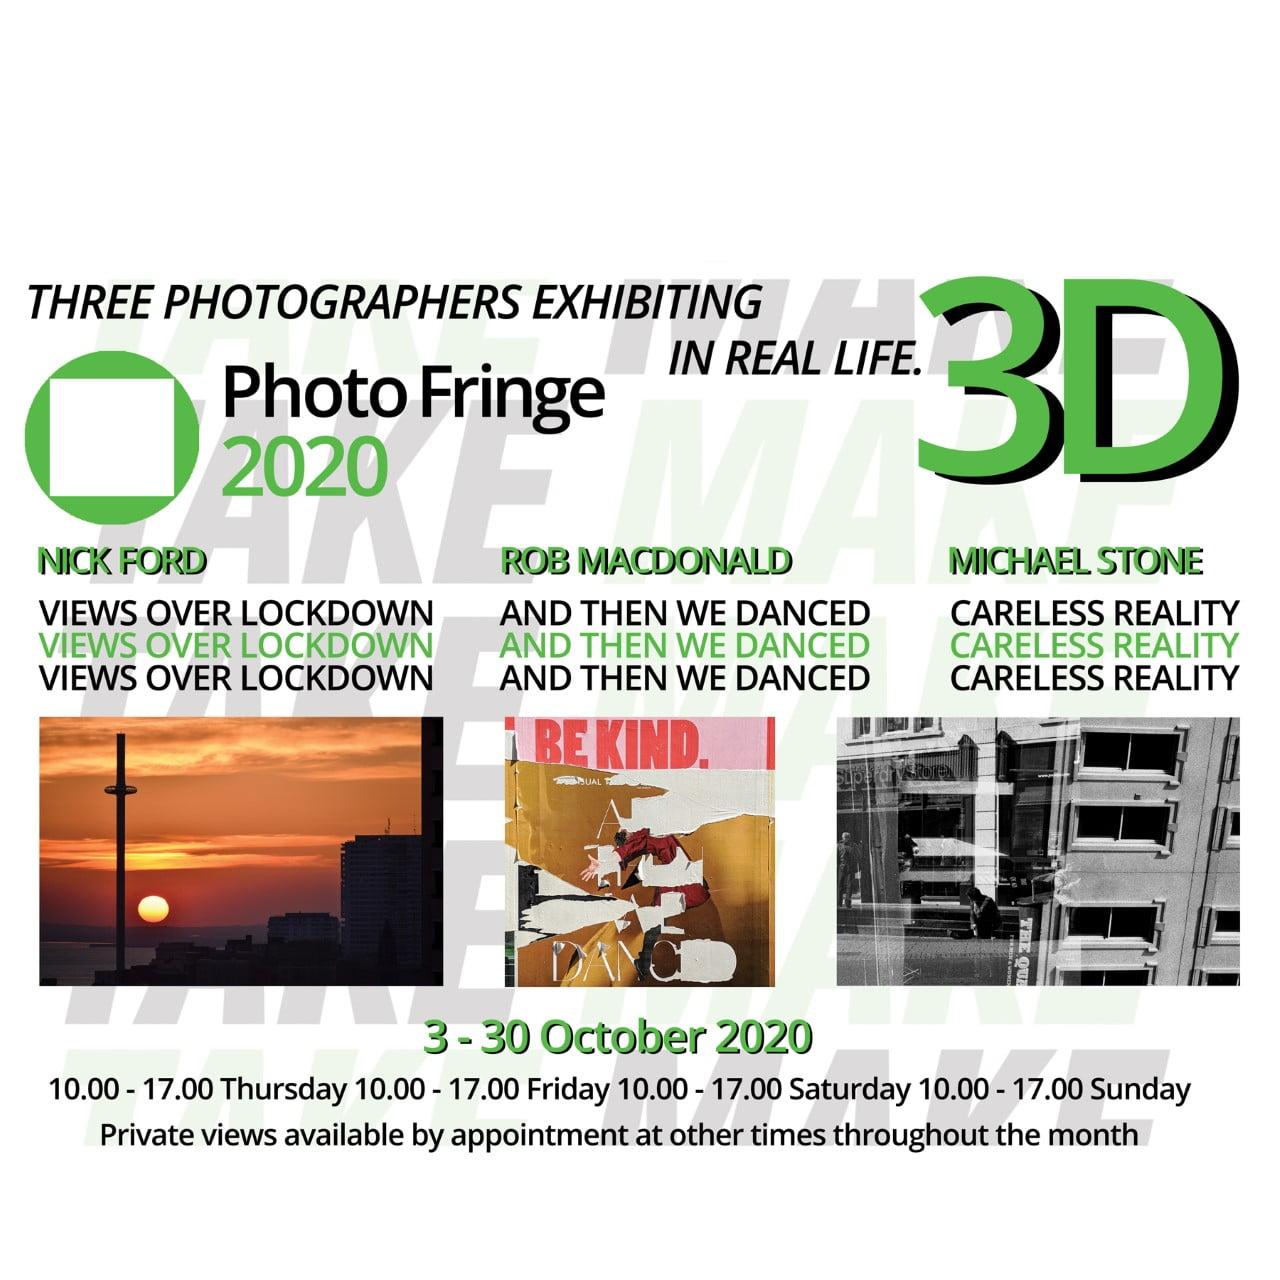 Photo Fringe 2020 – Exhibition '3D'